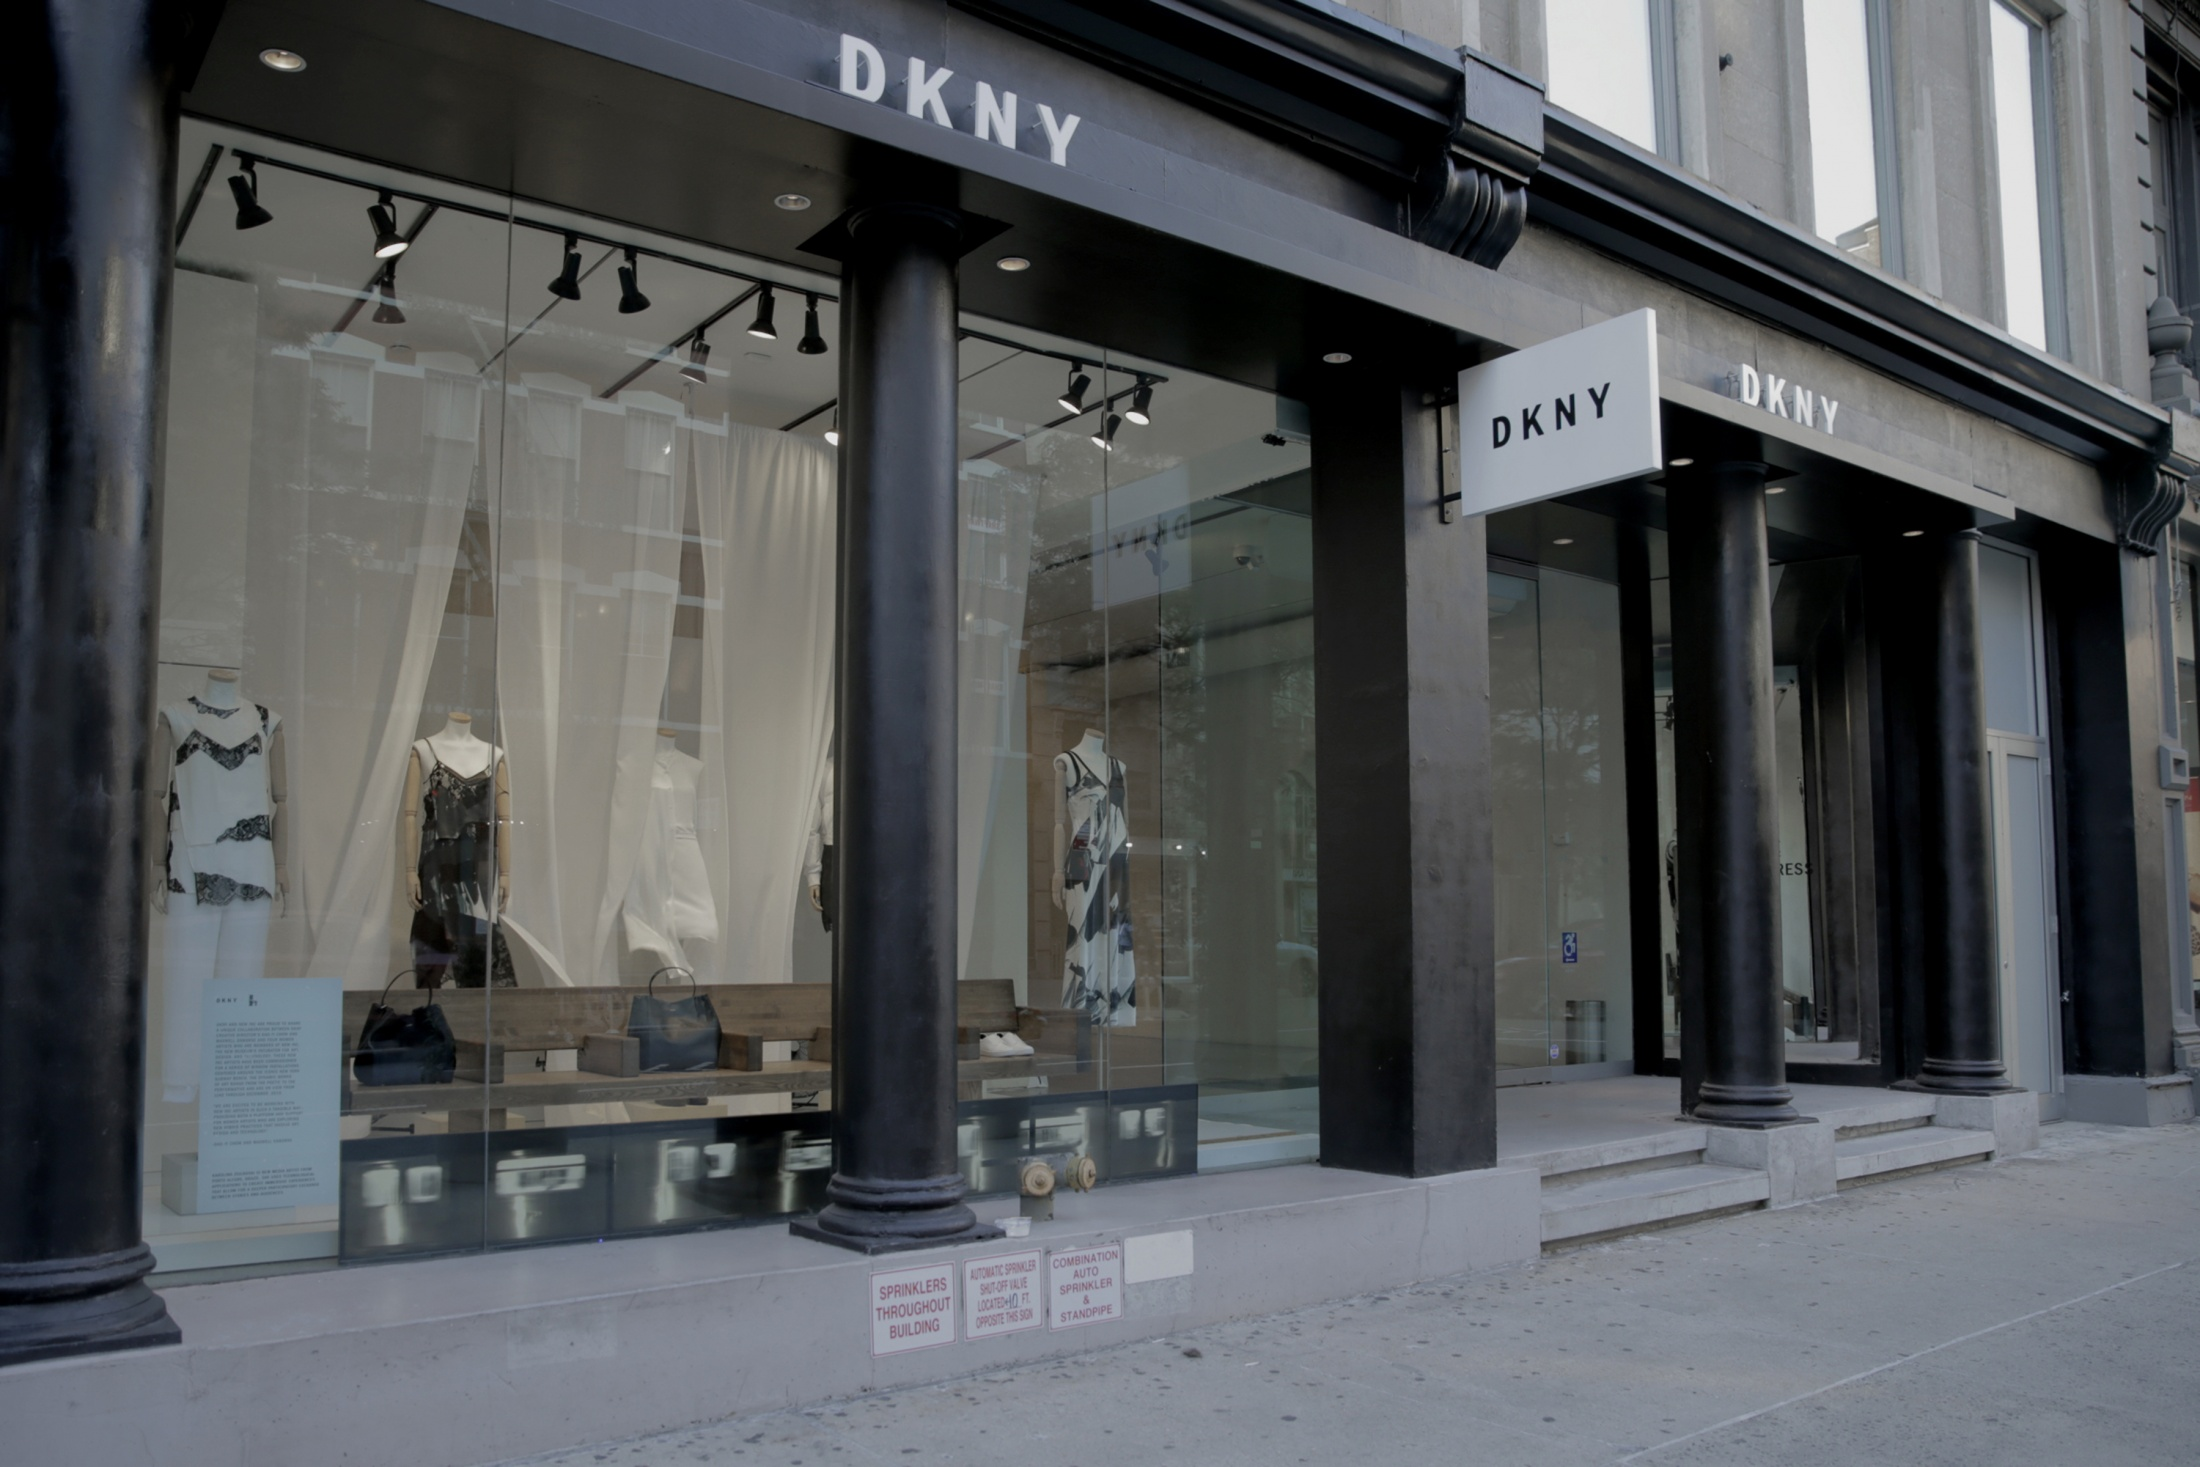 Thumbnail for Wind | DKNY X NEW INC